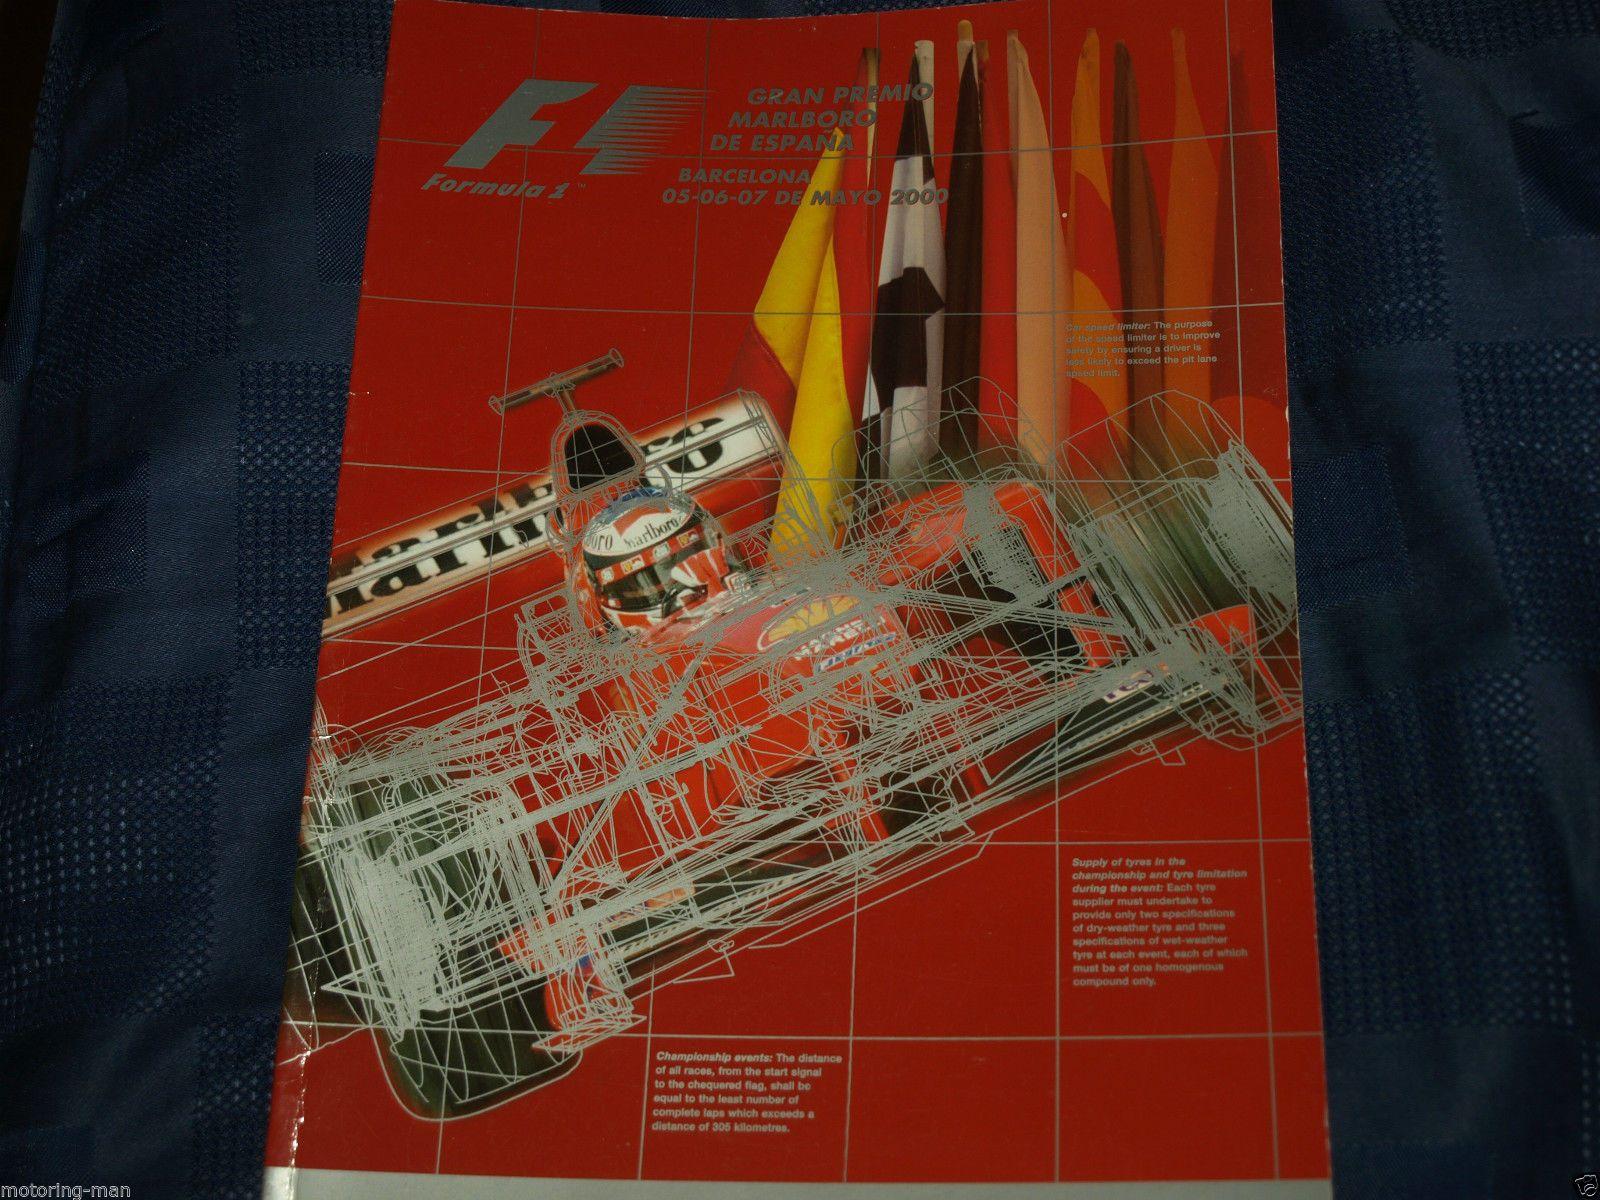 SPANISH SPAIN GRAND PRIX PROGRAMME 2000 DAMON HILL RALF MICHAEL SCHUMACHER WURZ | eBay